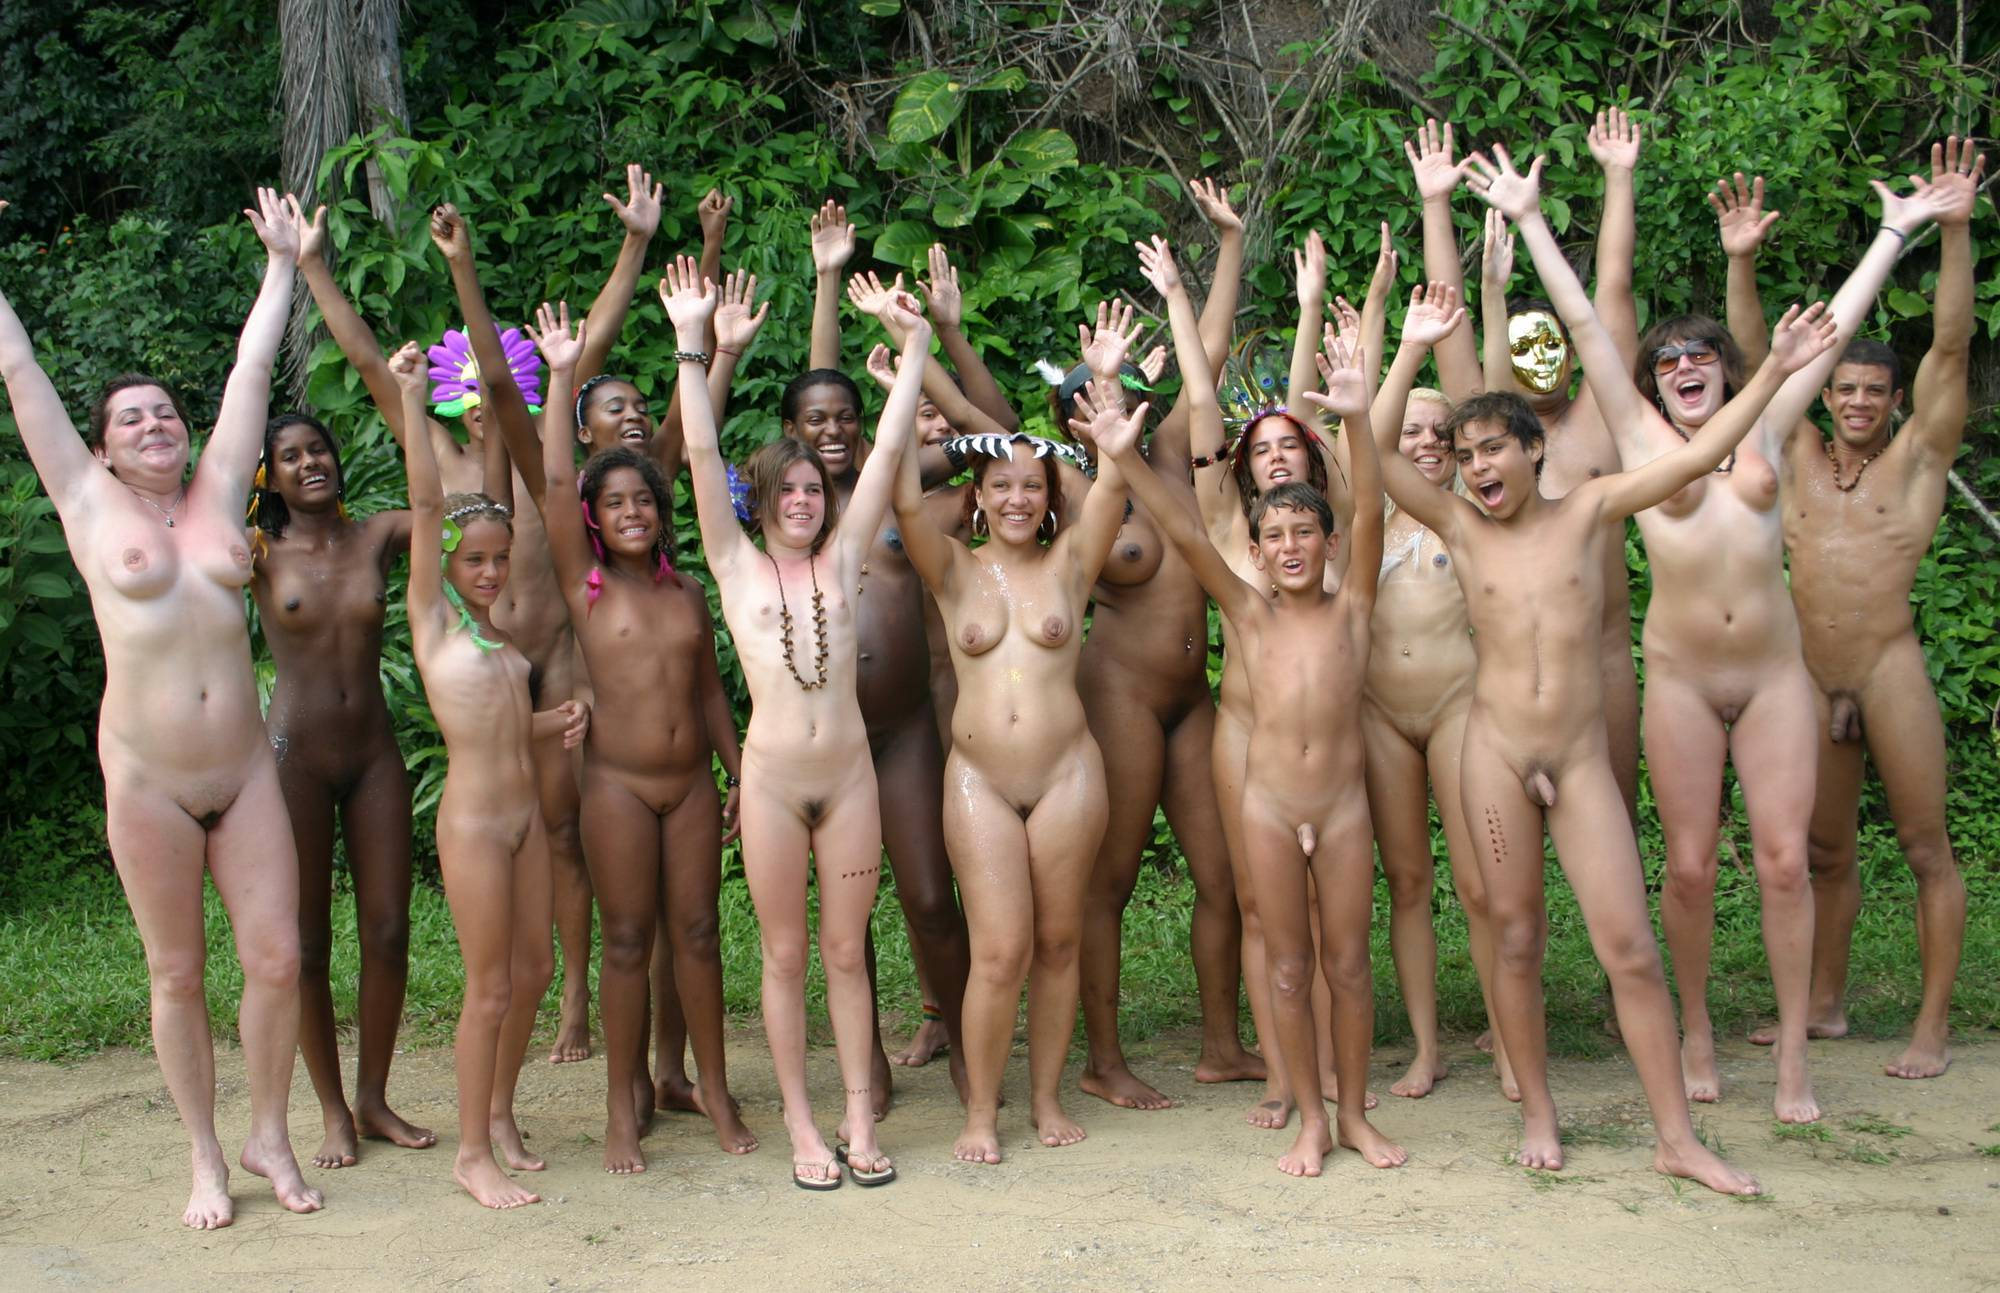 Nudist Photos Brazilian PN Banner Group - 2